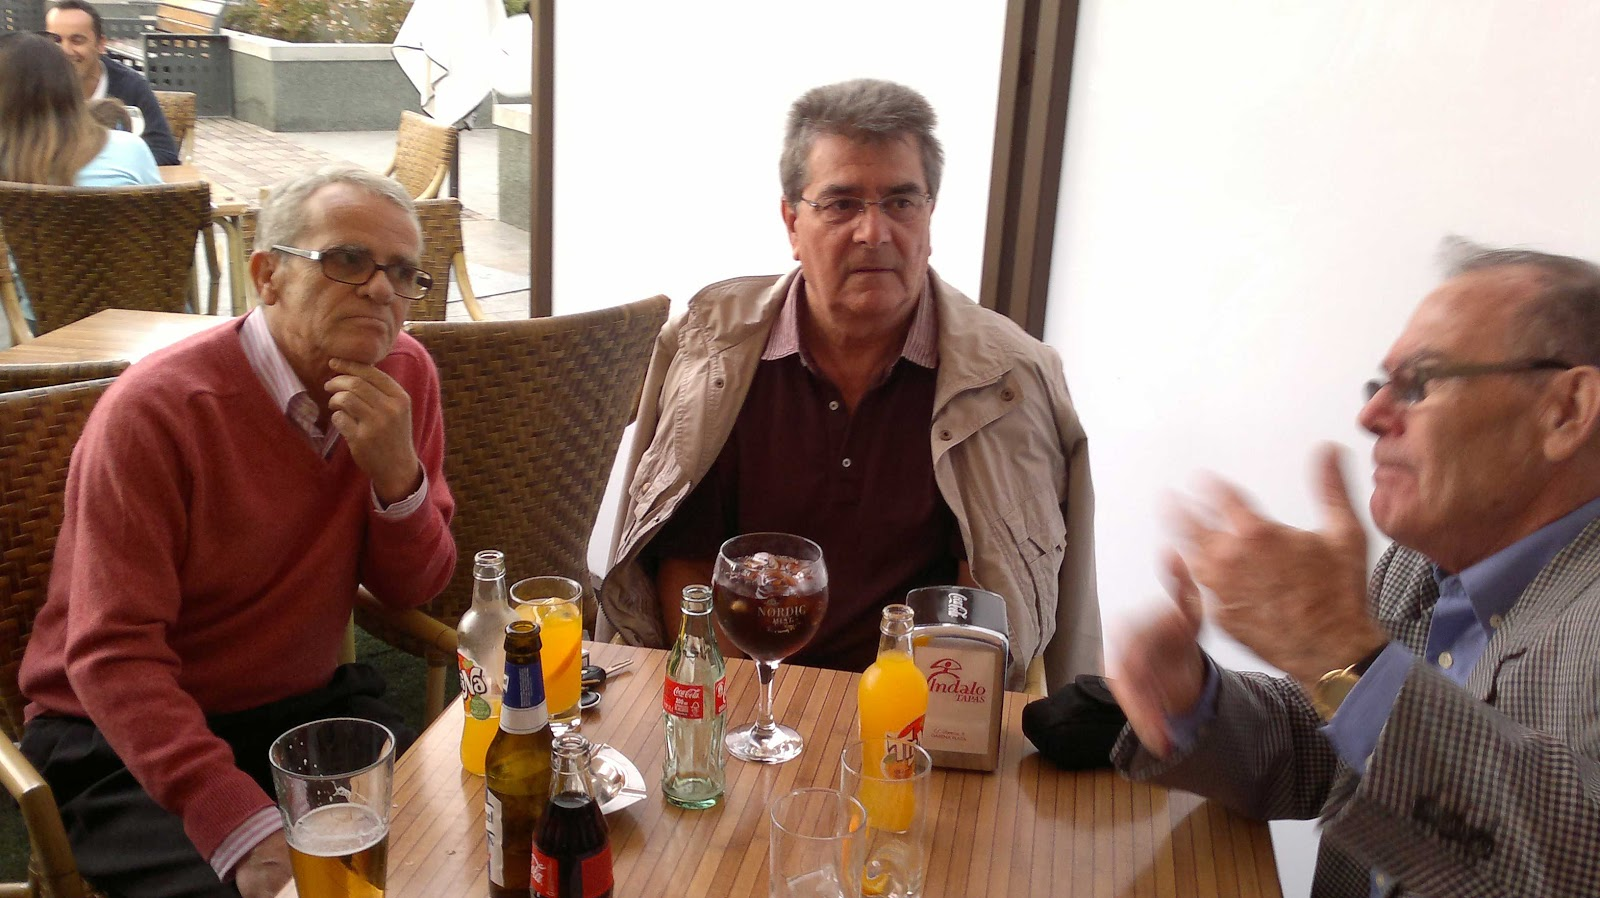 Encuentro en Alcalá 2012: Fotos enviadas por Bartolomé Asensio Mesas